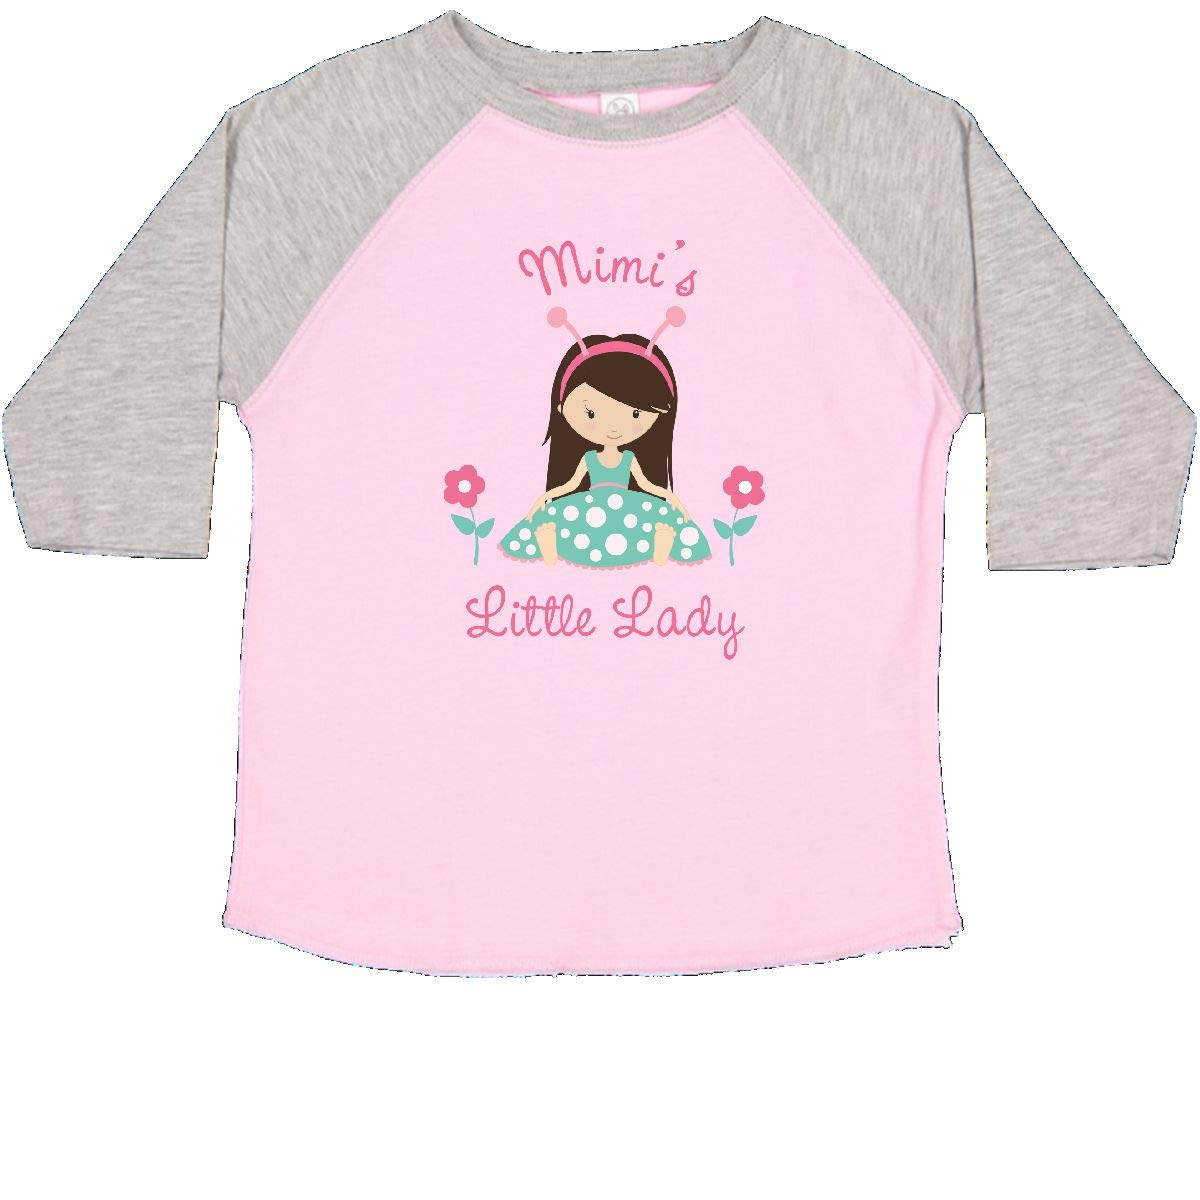 inktastic Mimis Little Lady Toddler T-Shirt